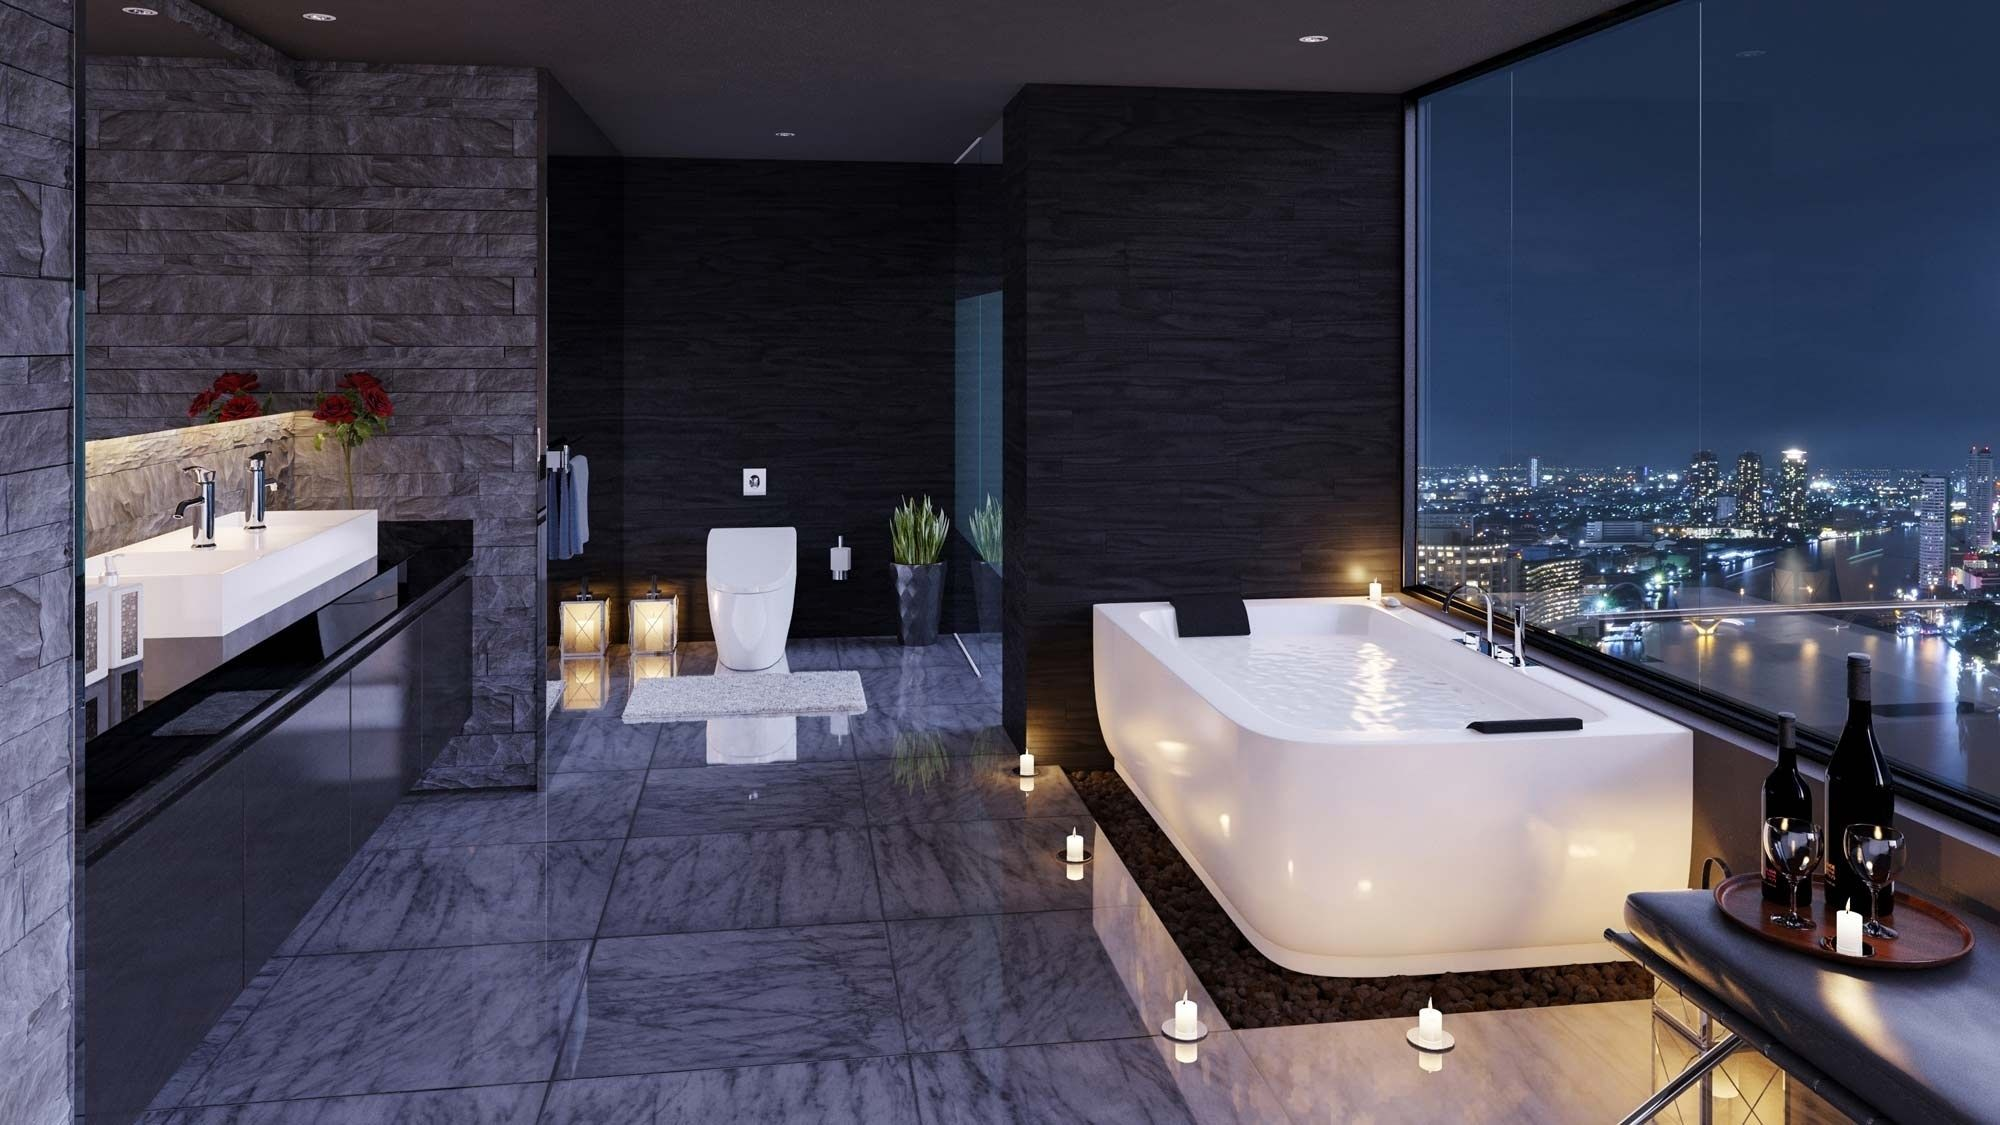 40 Stunning Luxury Bathrooms With Incredible Views Modern Luxury Bathroom Bathroom Design Luxury Modern Bathroom Design